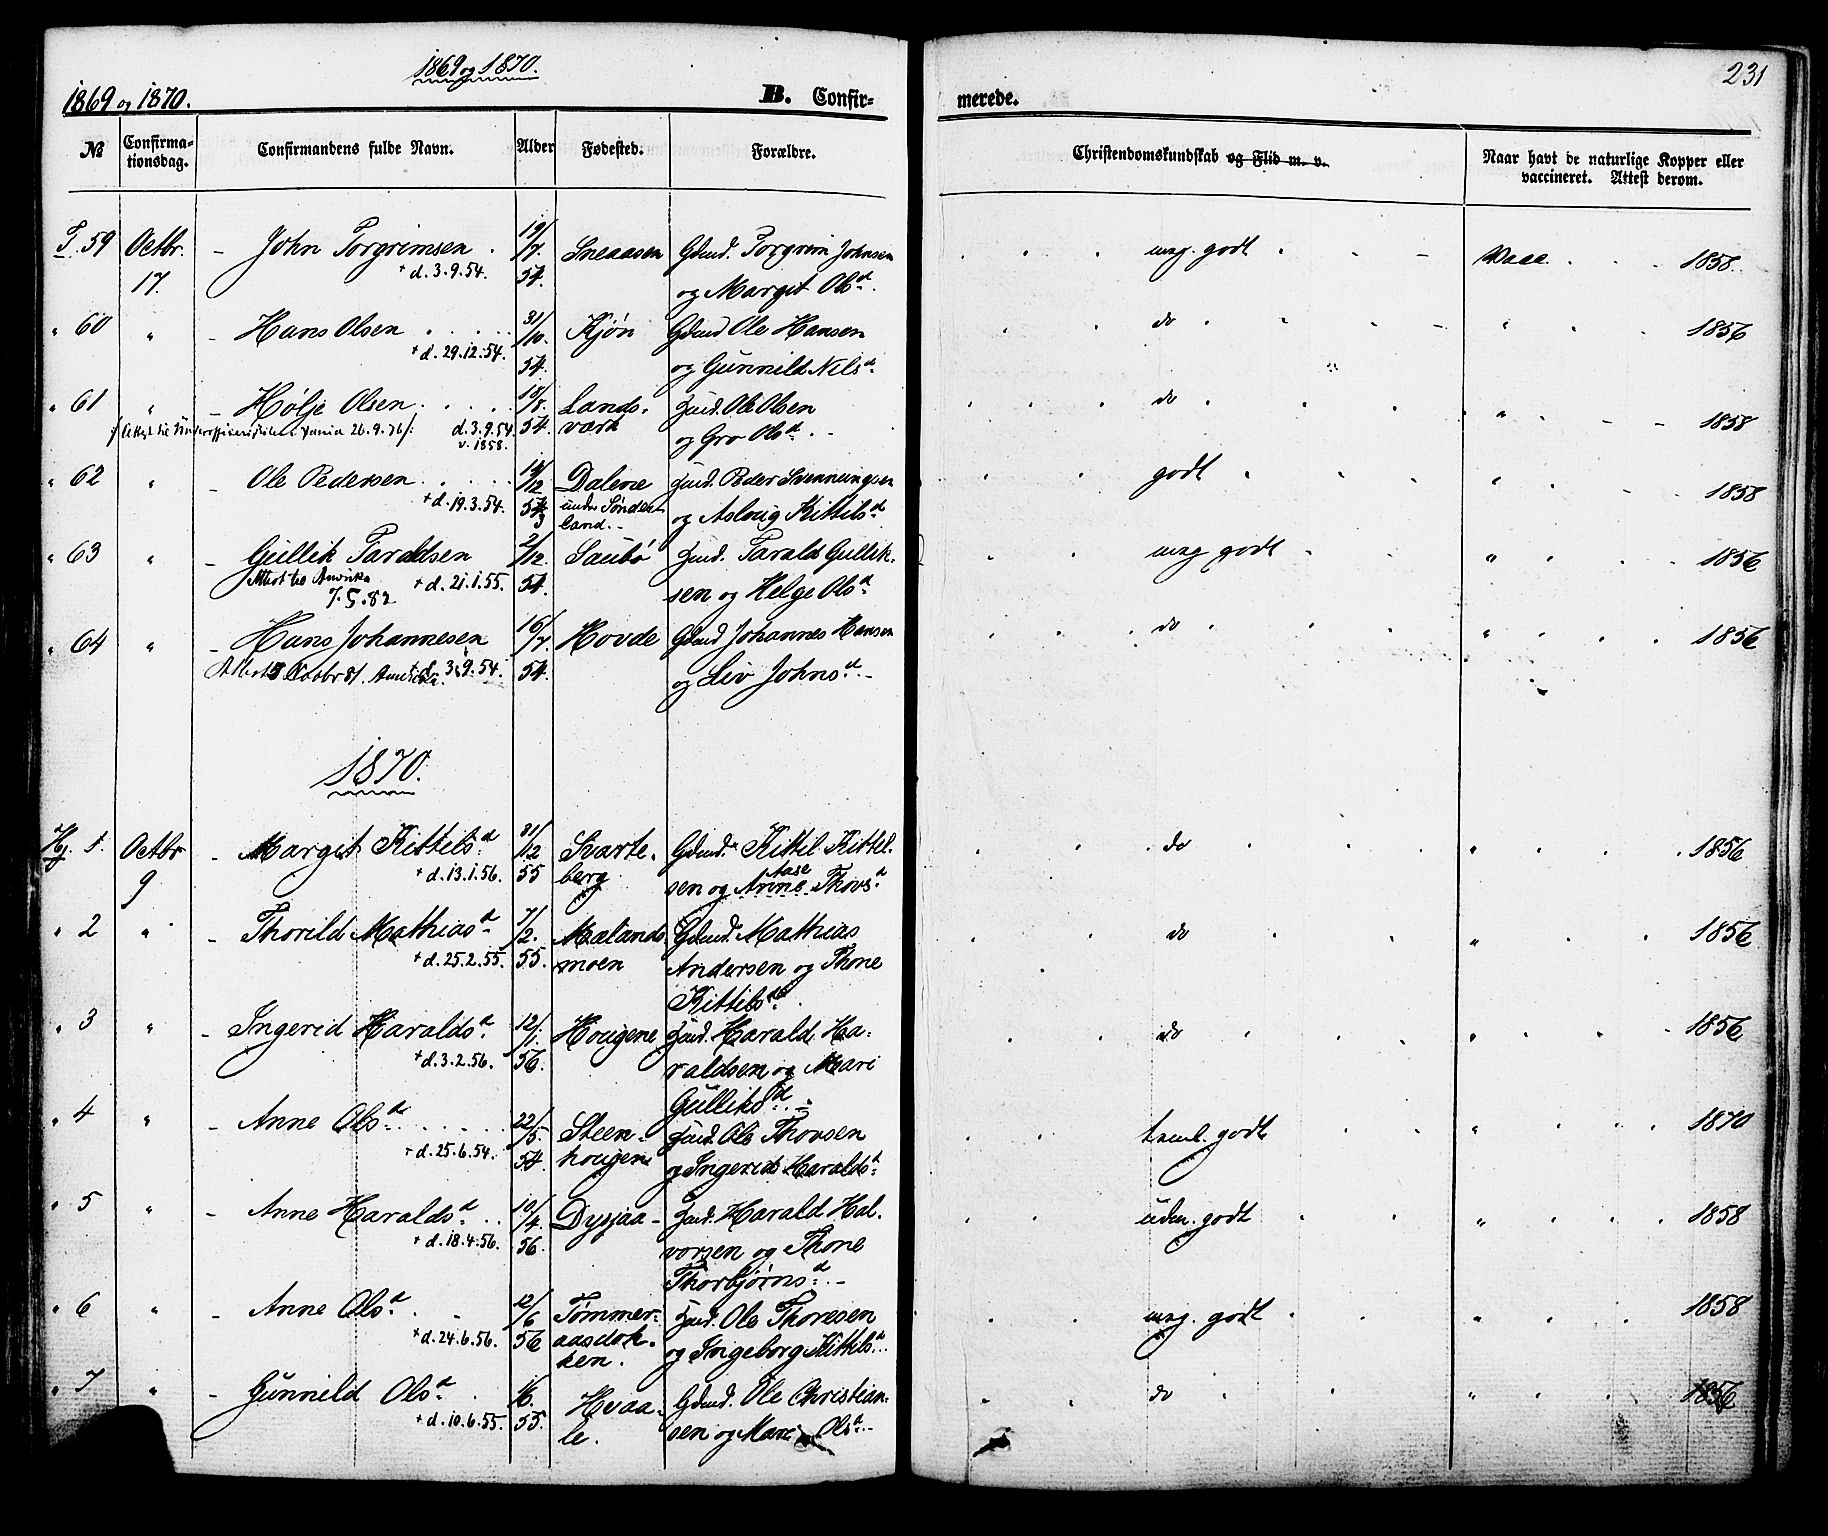 SAKO, Hjartdal kirkebøker, F/Fa/L0009: Ministerialbok nr. I 9, 1860-1879, s. 231